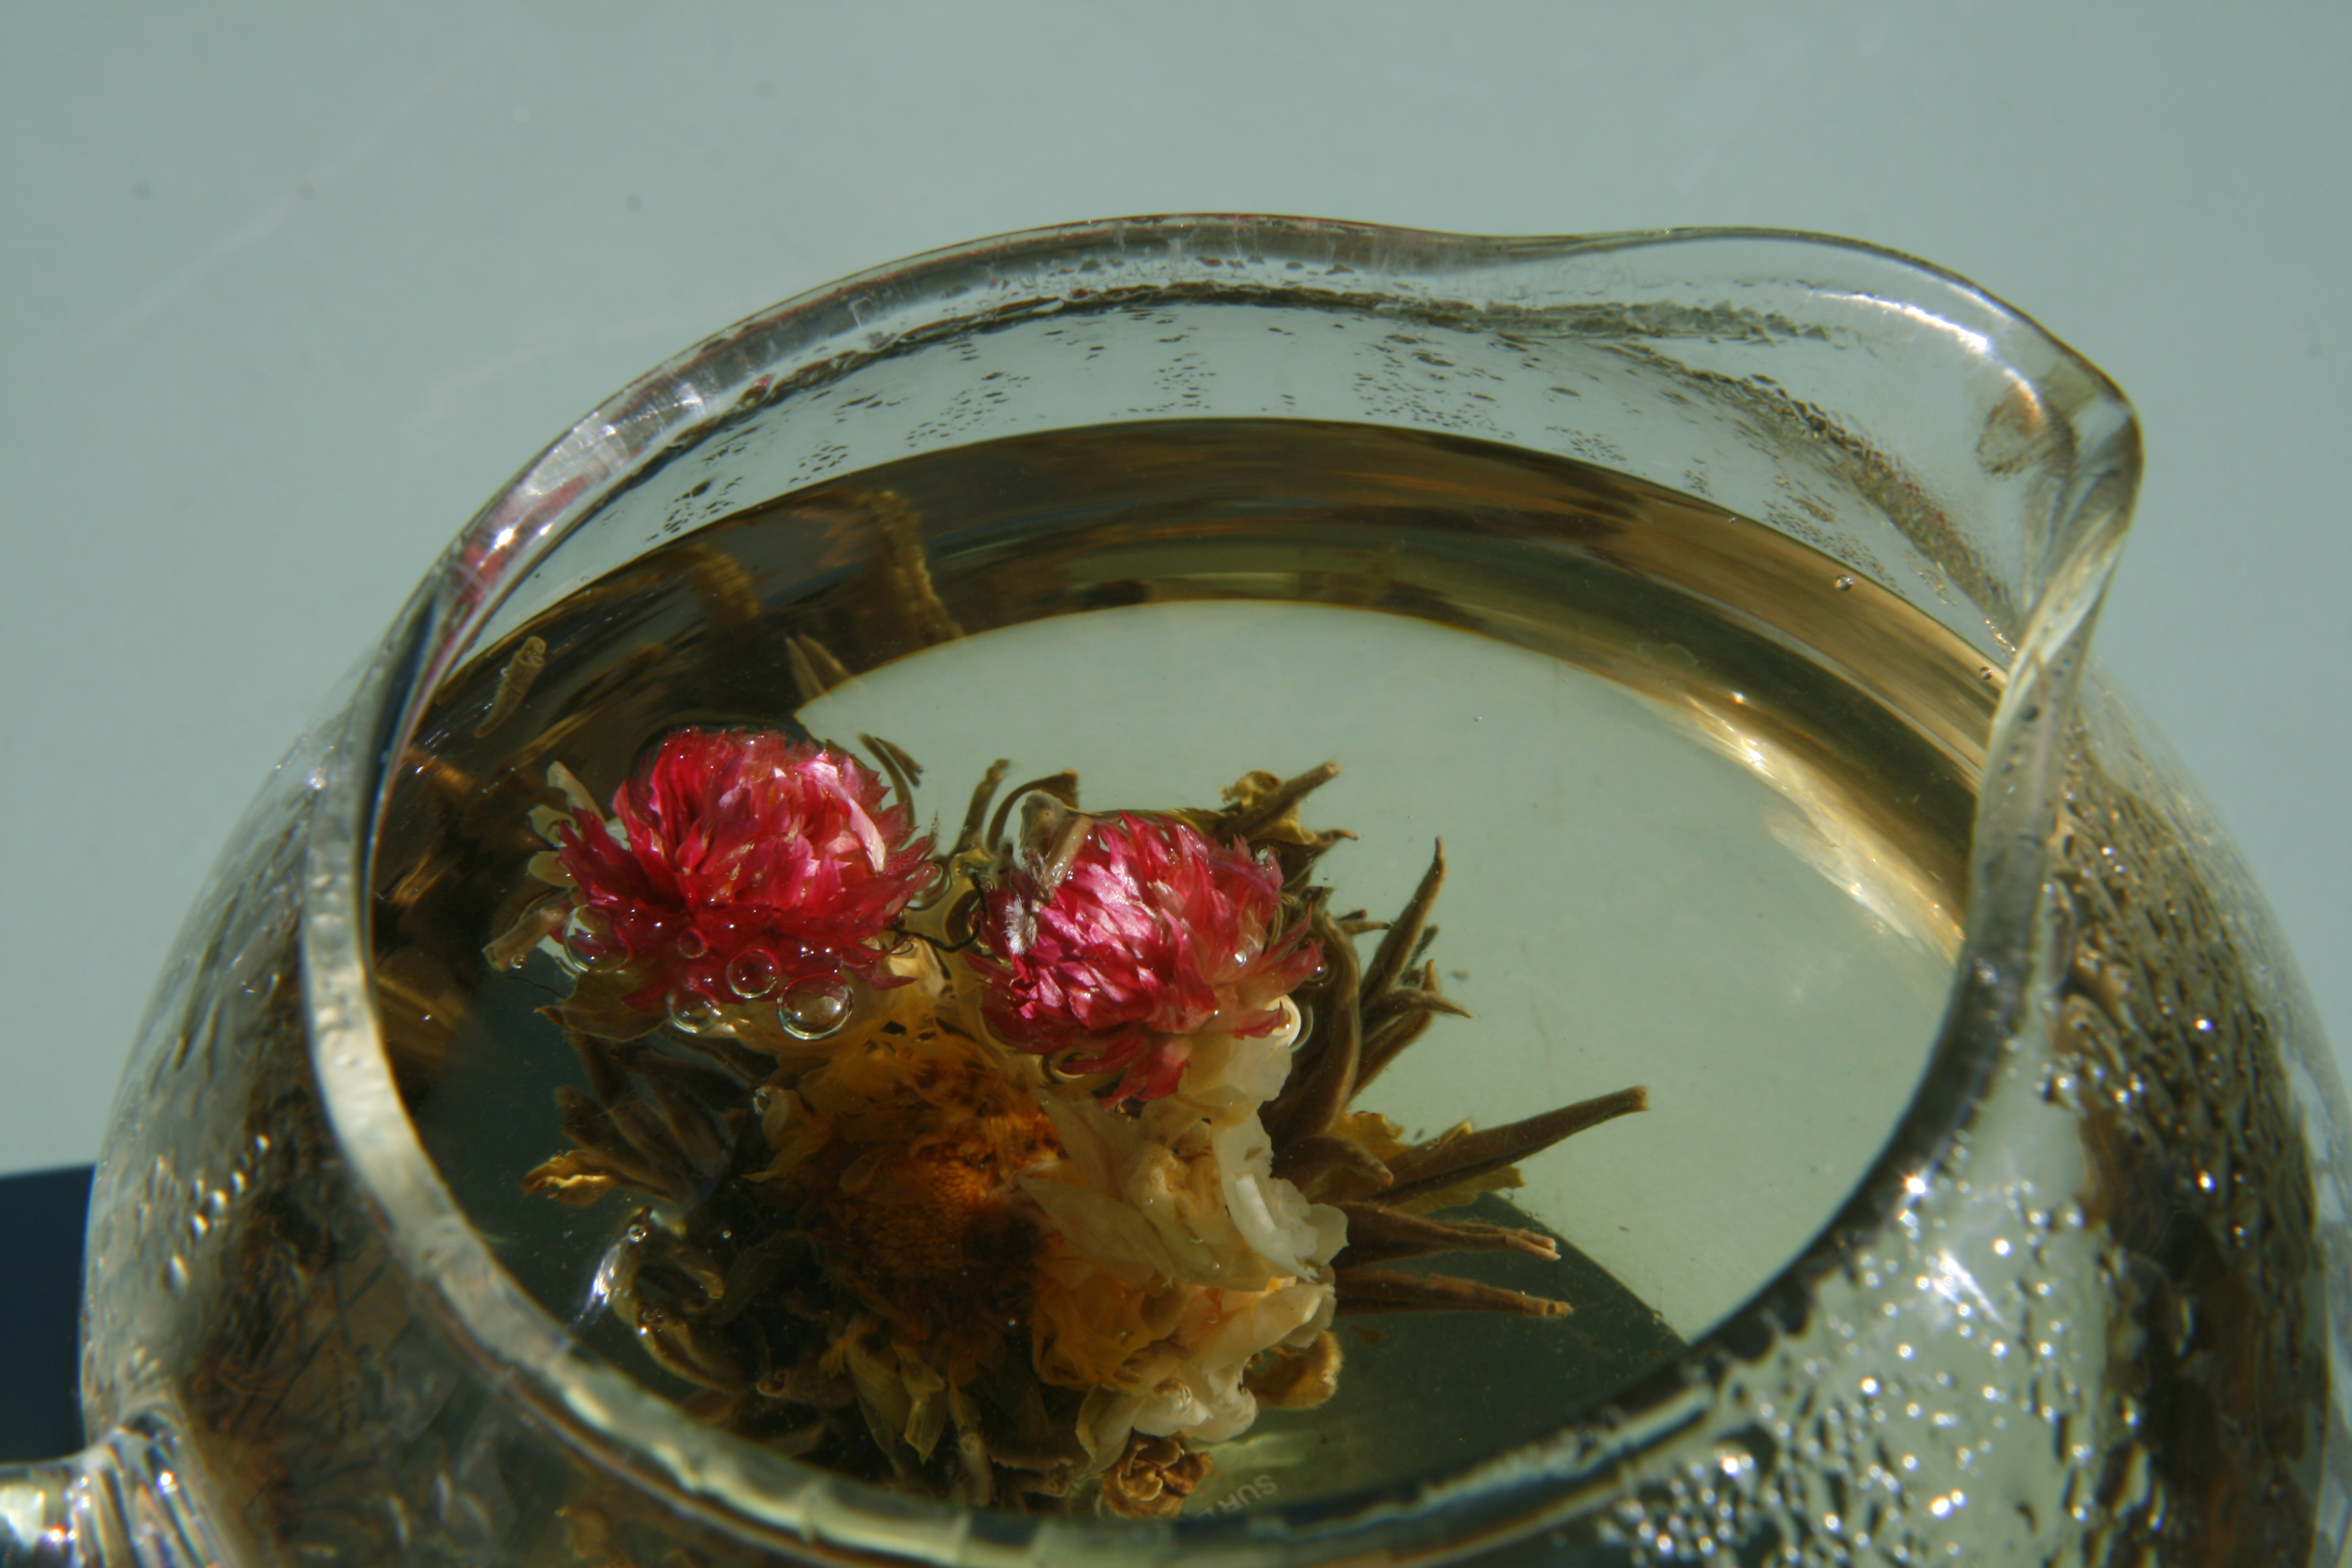 la fleur de thé au jasmin – pékin, lost in translation